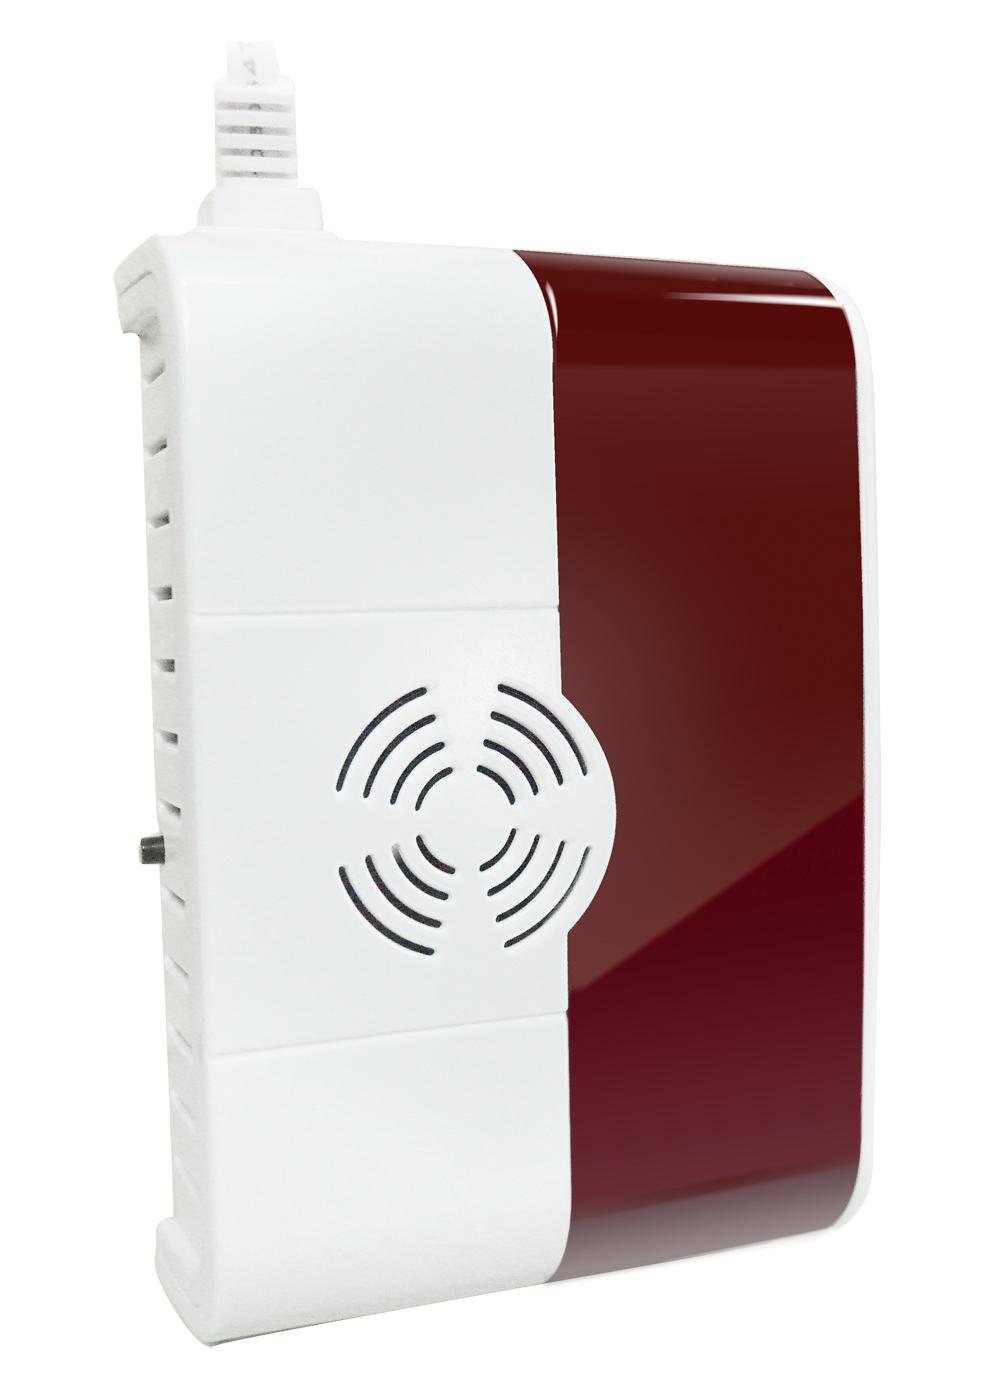 iGET SECURITY P6 - bezdrátový detektor plynu LPG/LNG/CNG, samostatný nebo pro alarm M3B a M2B - SECURITY P6